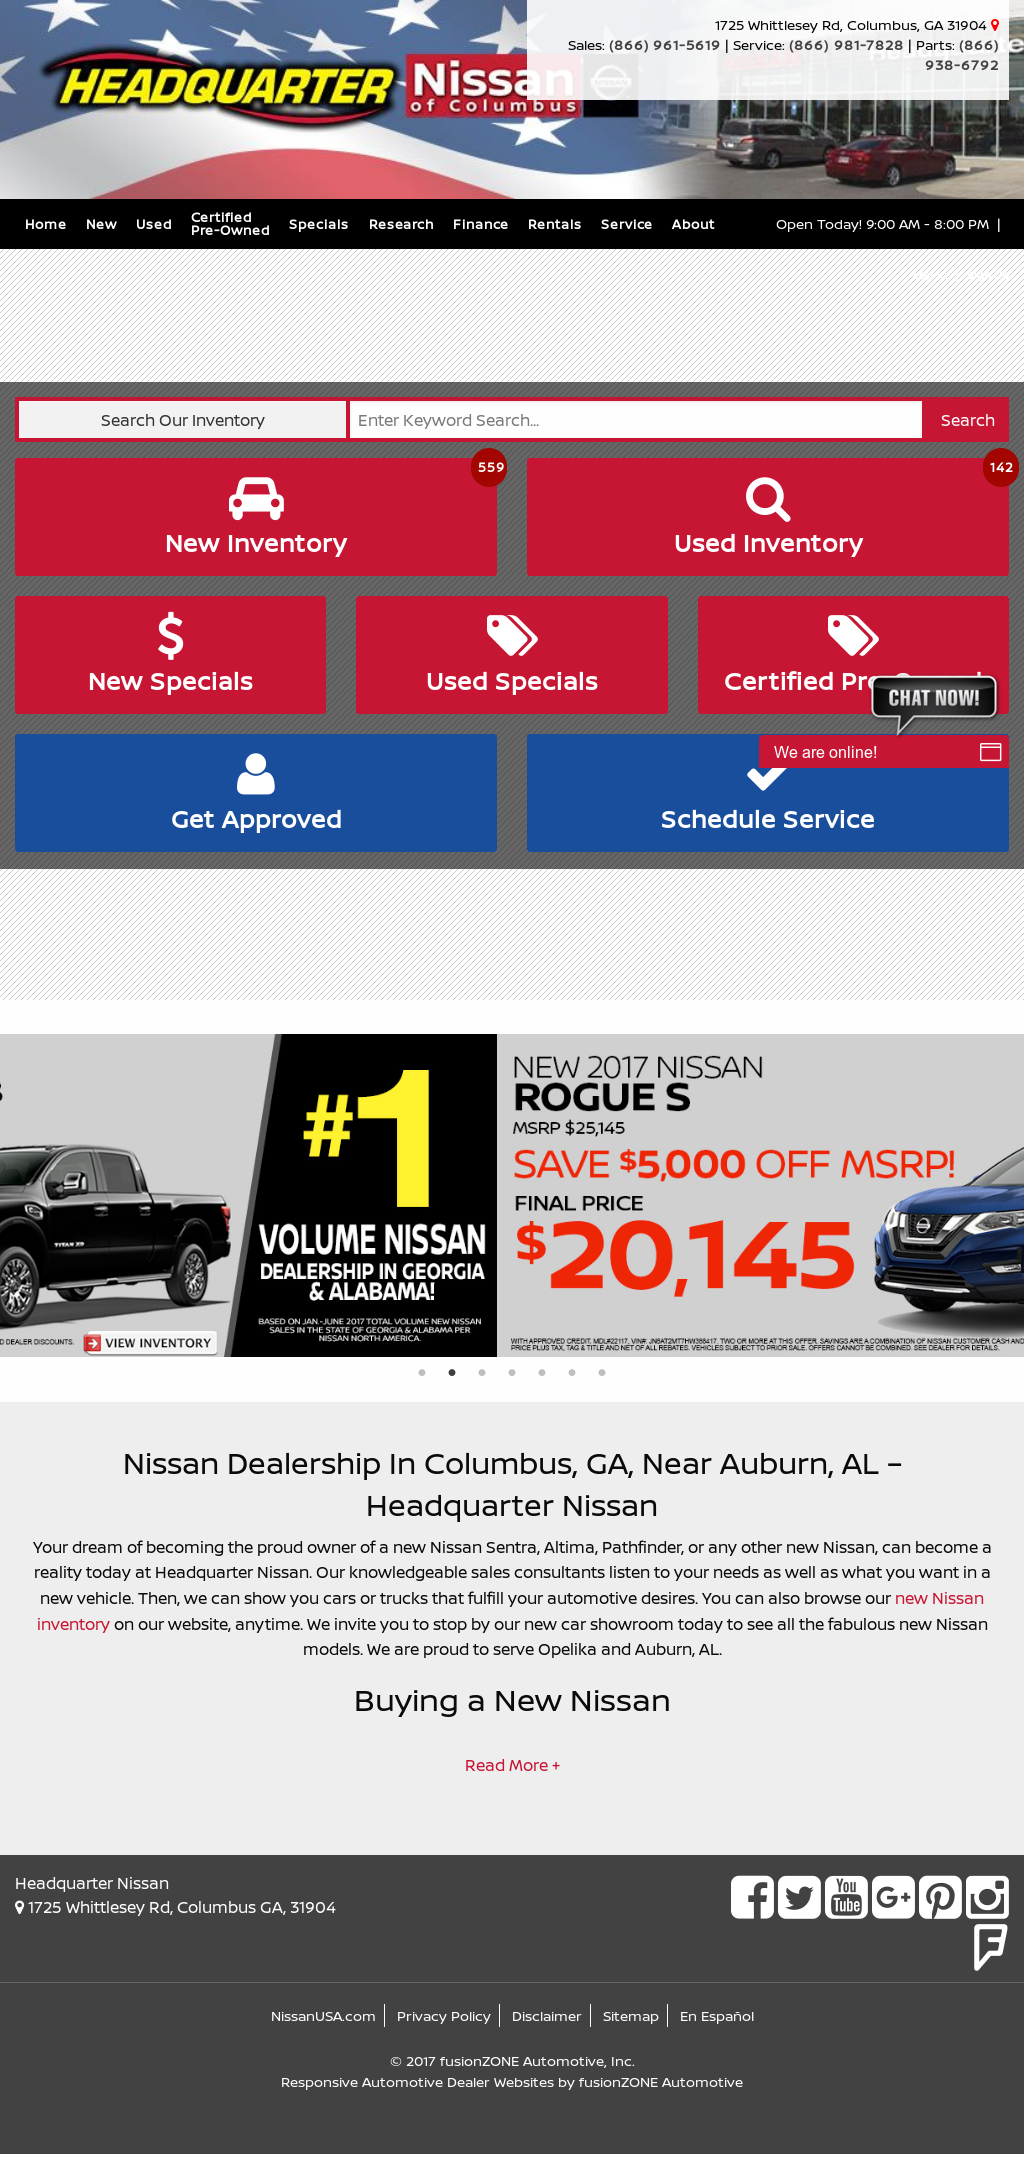 Headquarter Nissan Of Columbus Website History